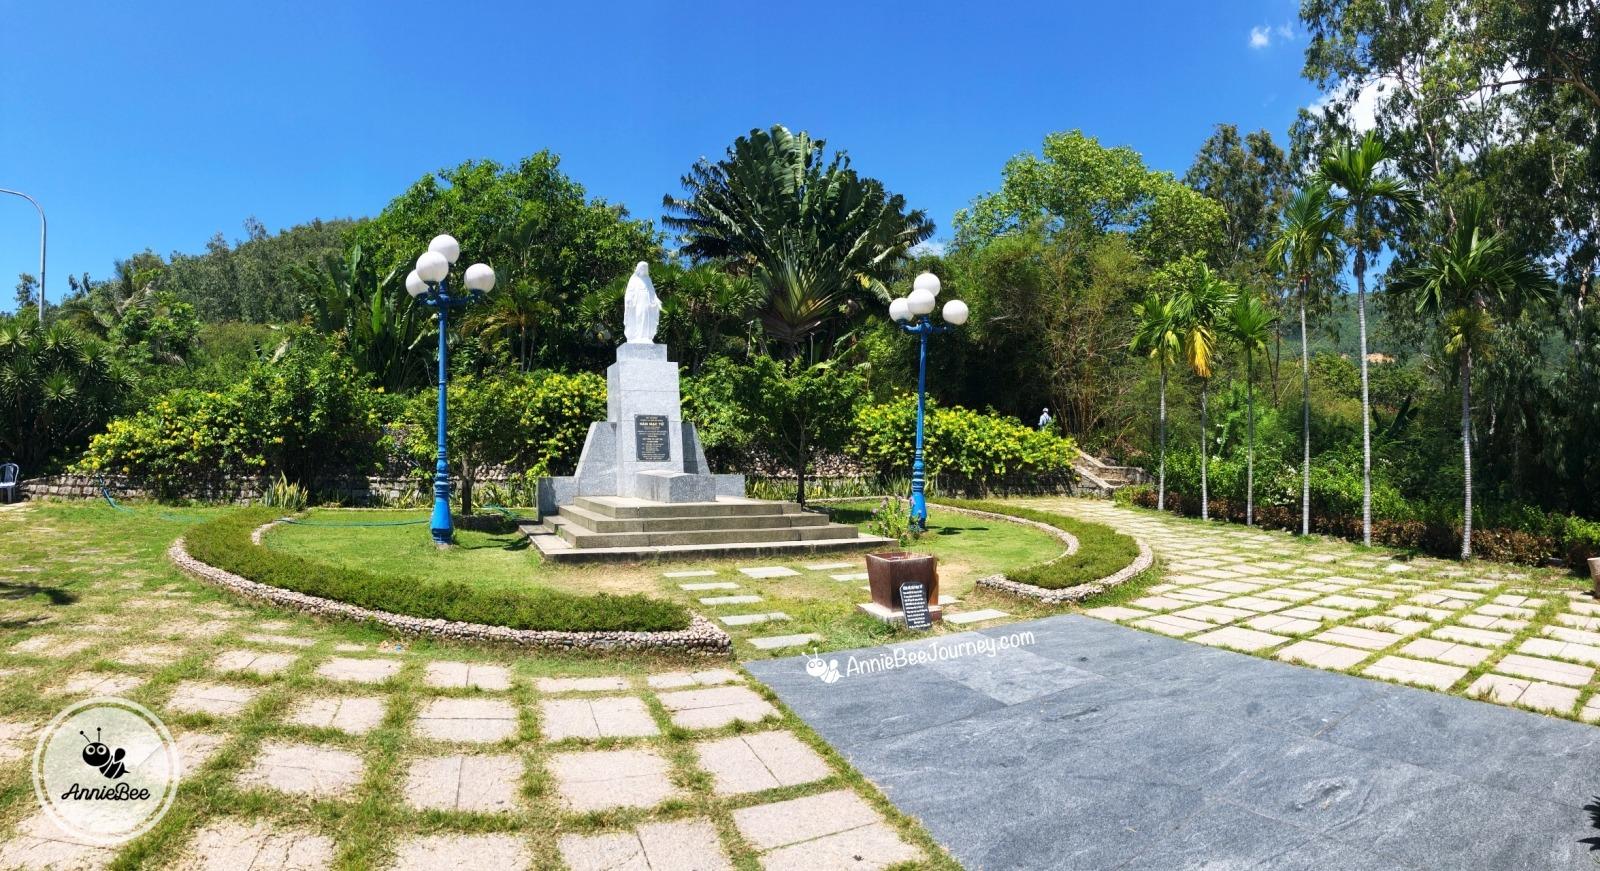 Han Mac Tu Tomb in Ghenh Rang, Quy Nhon, Vietnam